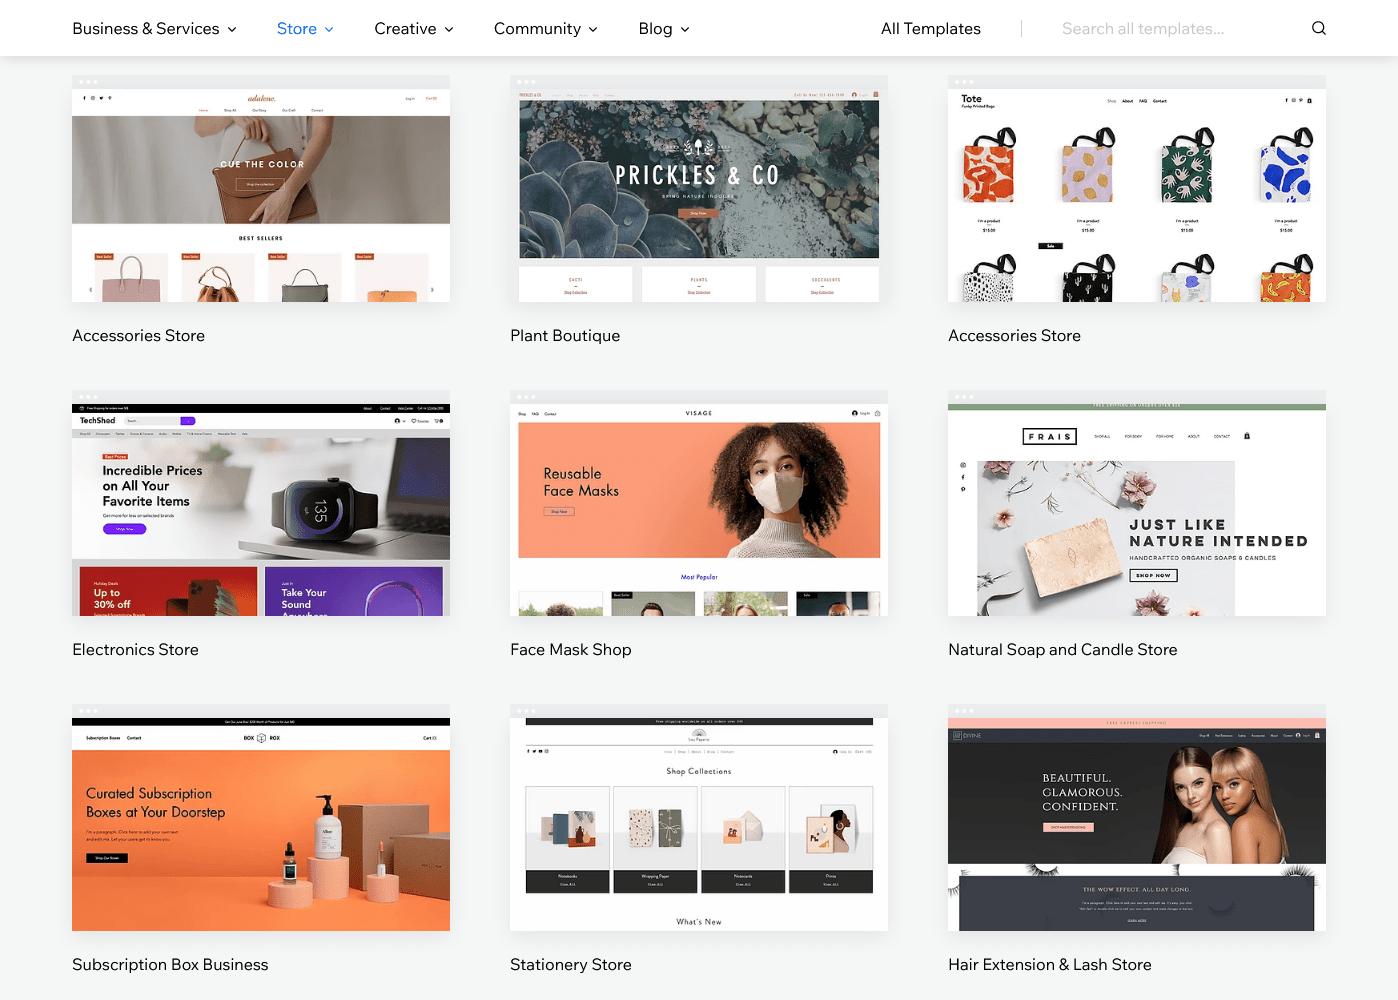 Wix's ecommerce templates